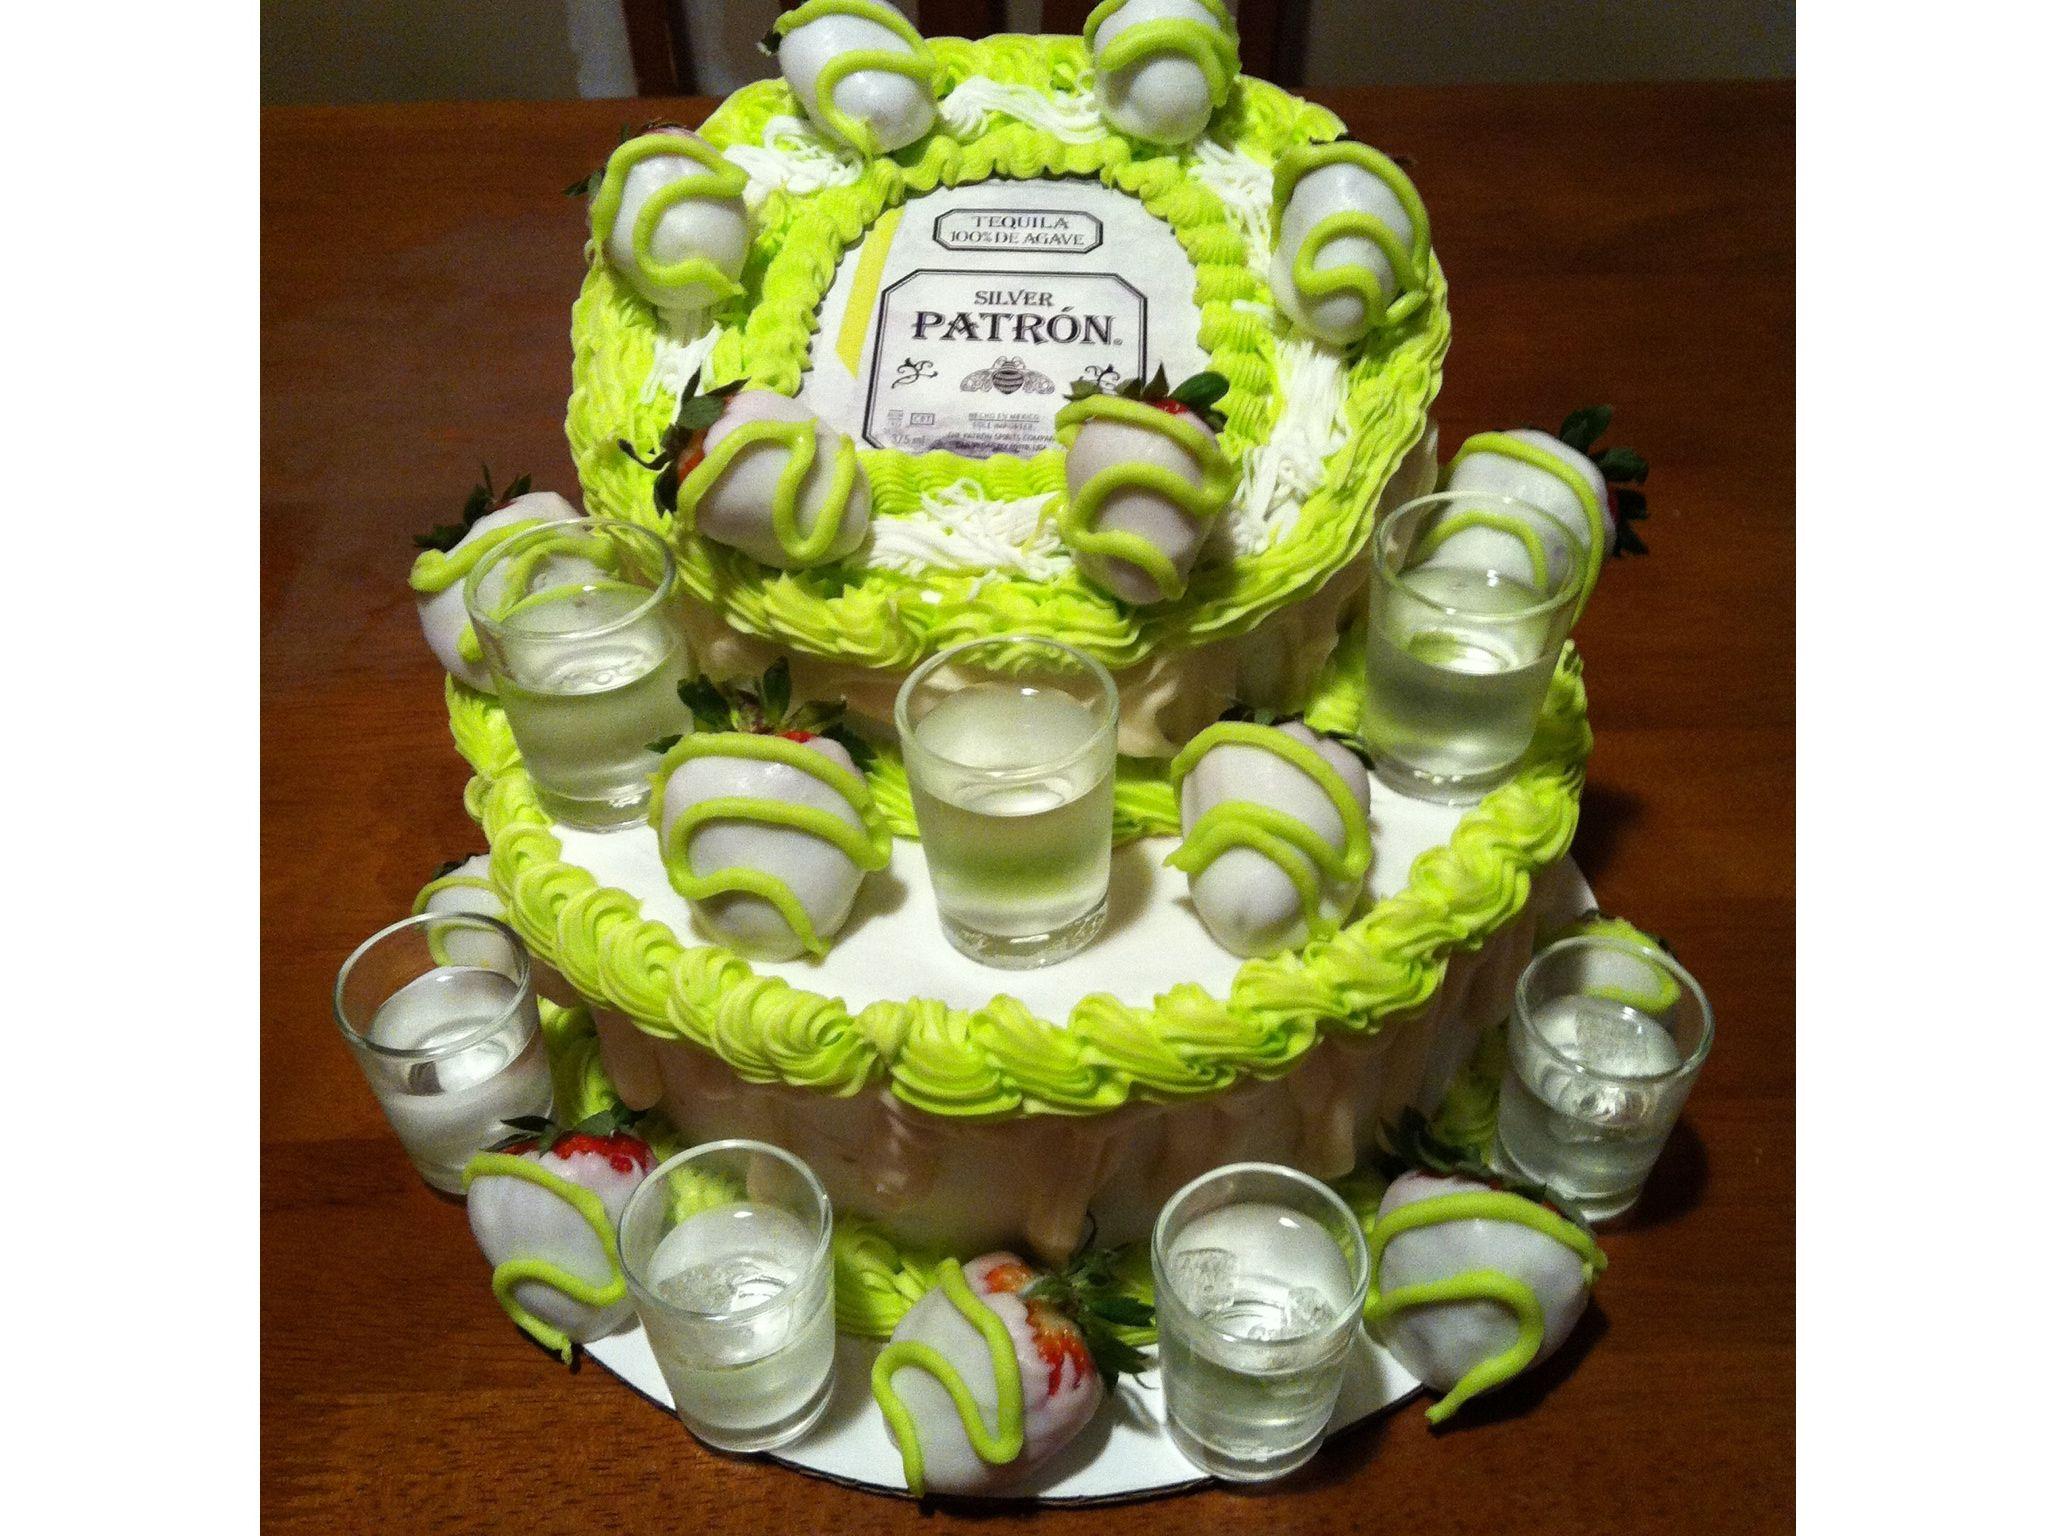 Patron Cake Gordos Th Birthday Bash Plans Pinterest Cake - Patron birthday cake